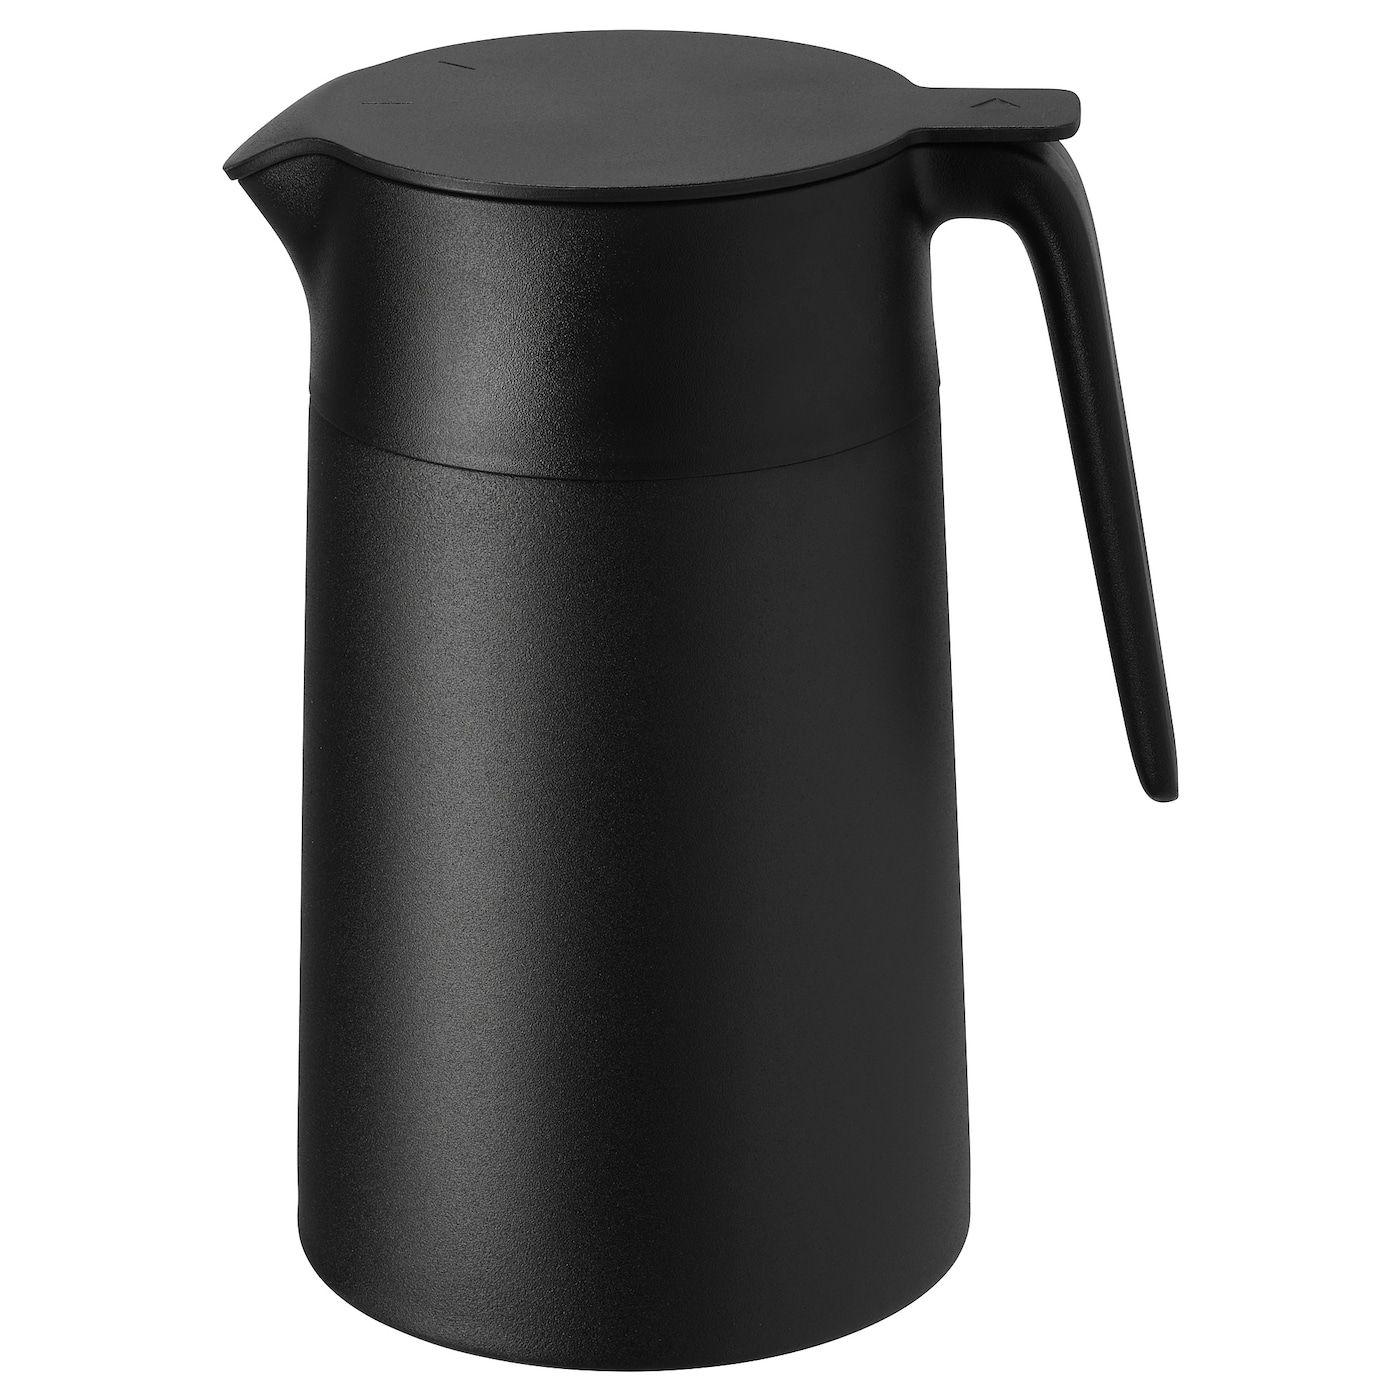 Underlatta Isolierkanne Schwarz Ikea Osterreich In 2020 Vacuum Flask Glass Spice Jars Ikea